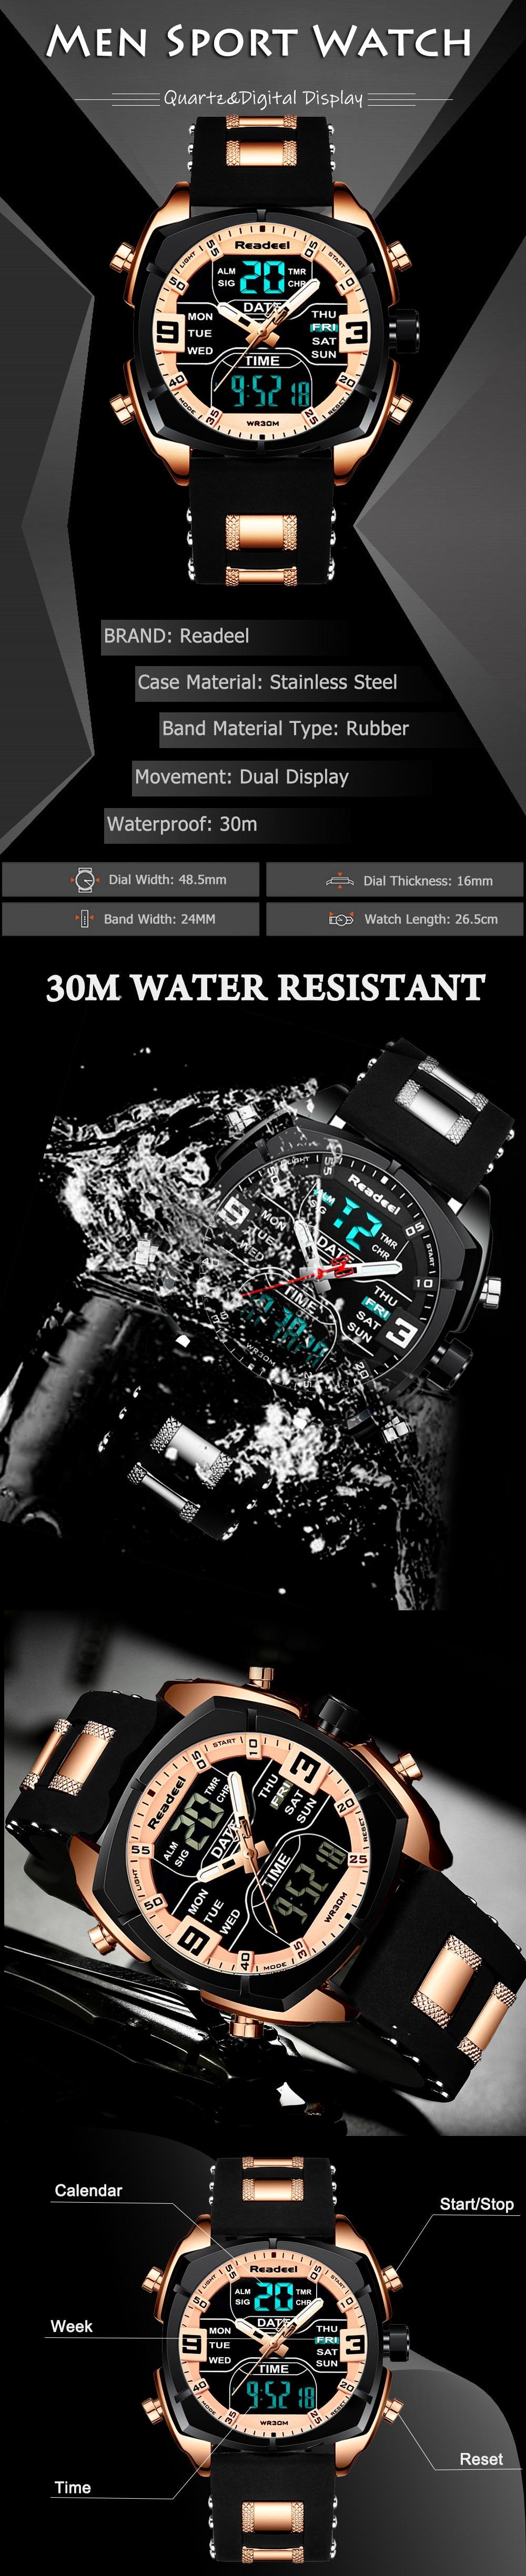 H2281947eac514c4d8b0233cca8ff4bbdo Mens Watches Luxury Brand Men Sports Watches Men's Quartz LED Digital Clock Male Rubber Military Wrist Watch Relogios Masculinos